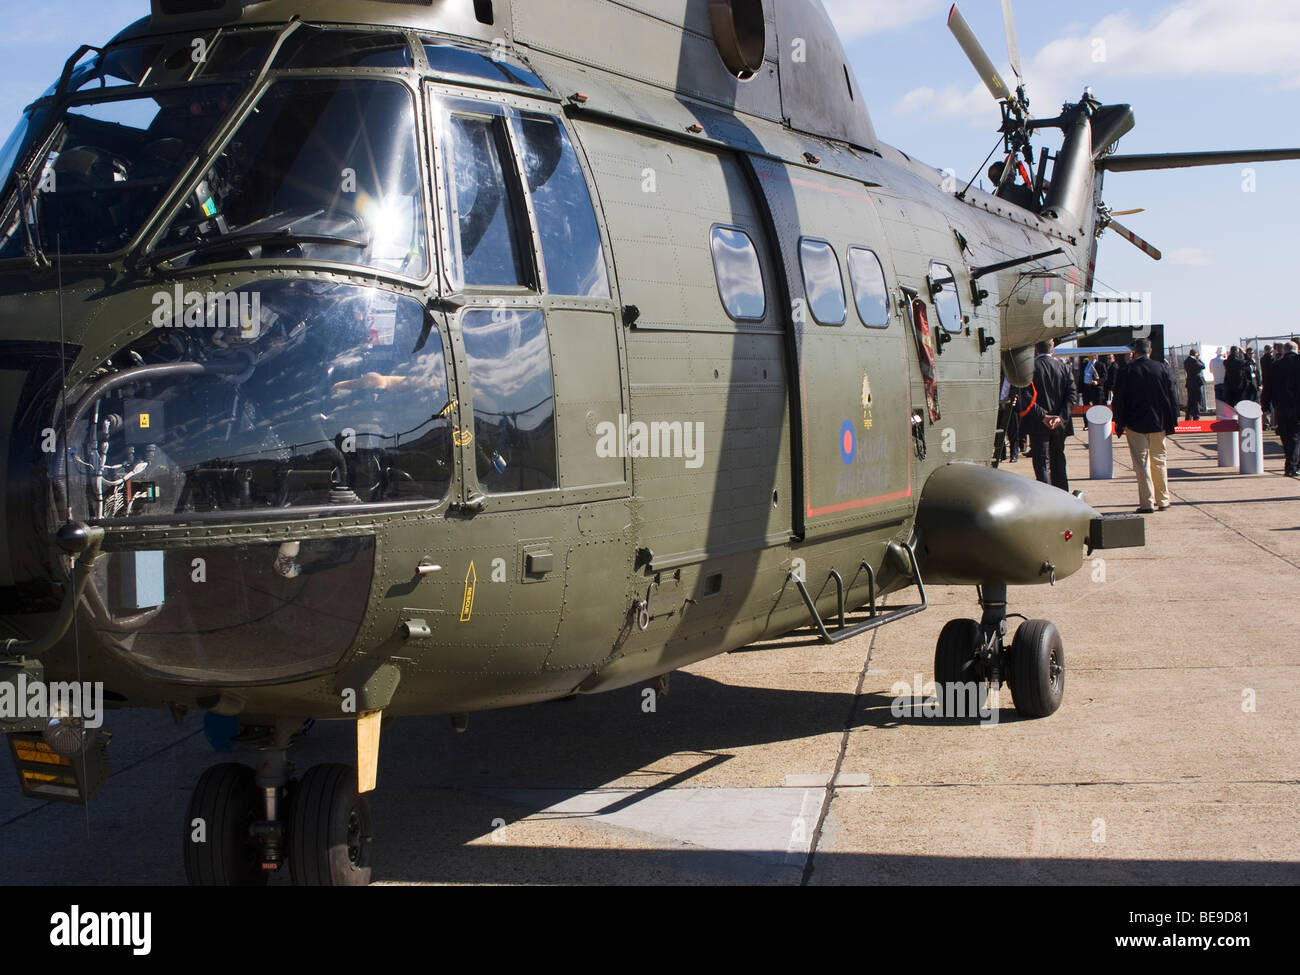 Elicottero Puma : Aerospatiale westland sa puma hc helicopter xw